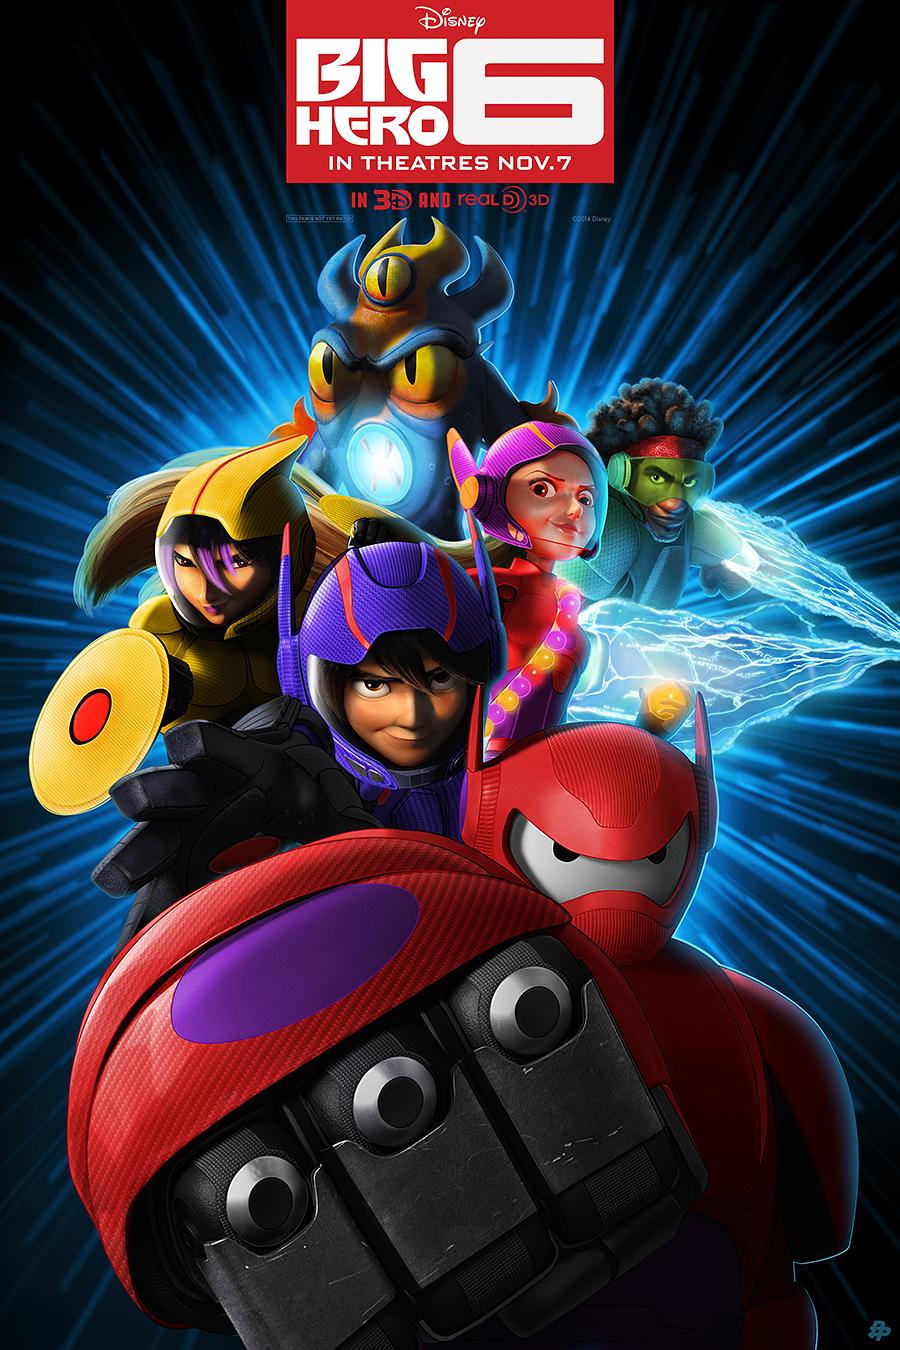 big hero 6 full movie for free hd